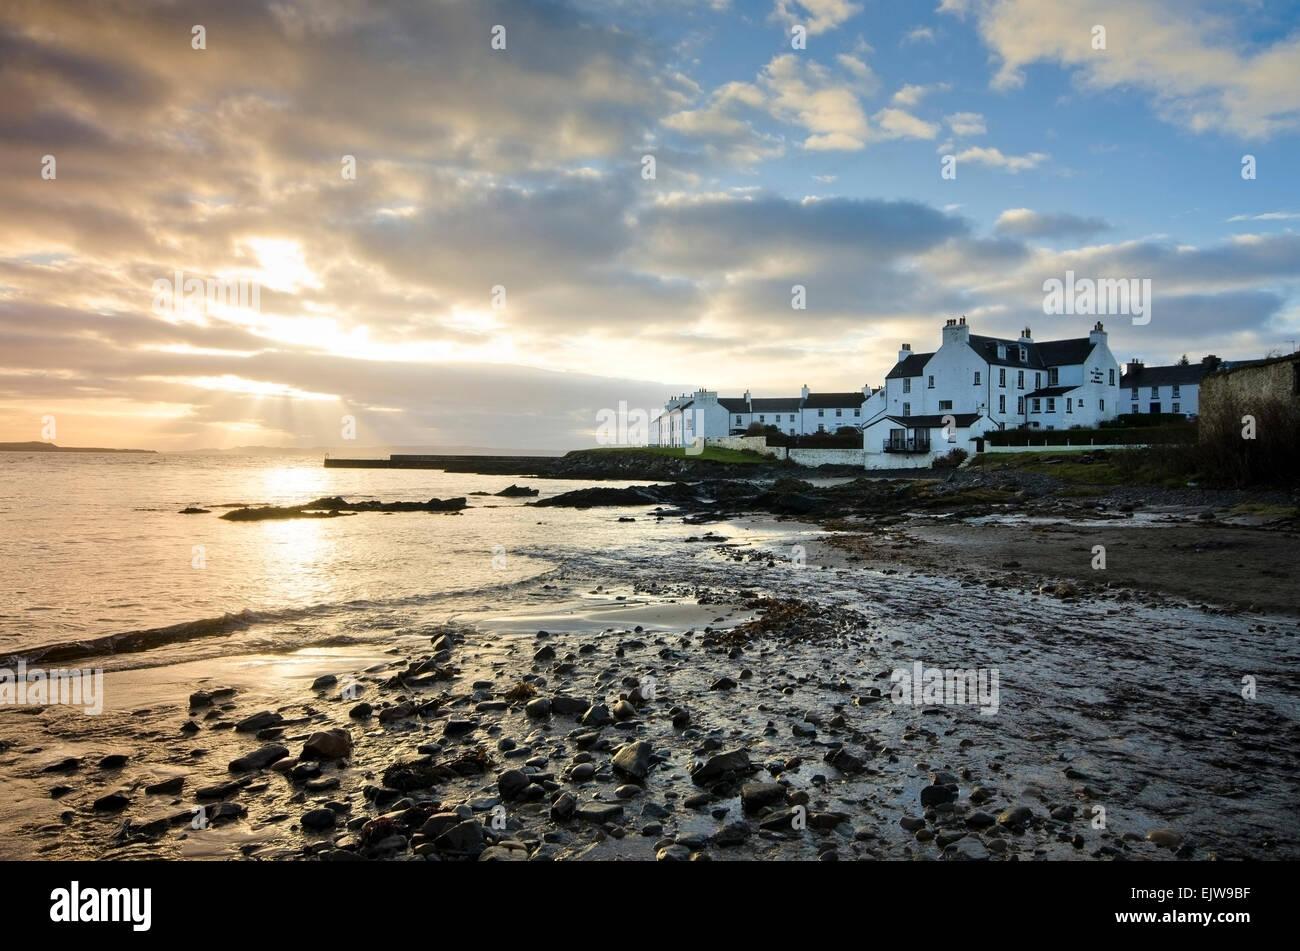 port charlotte isle of islay bay sunset shore - Stock Image